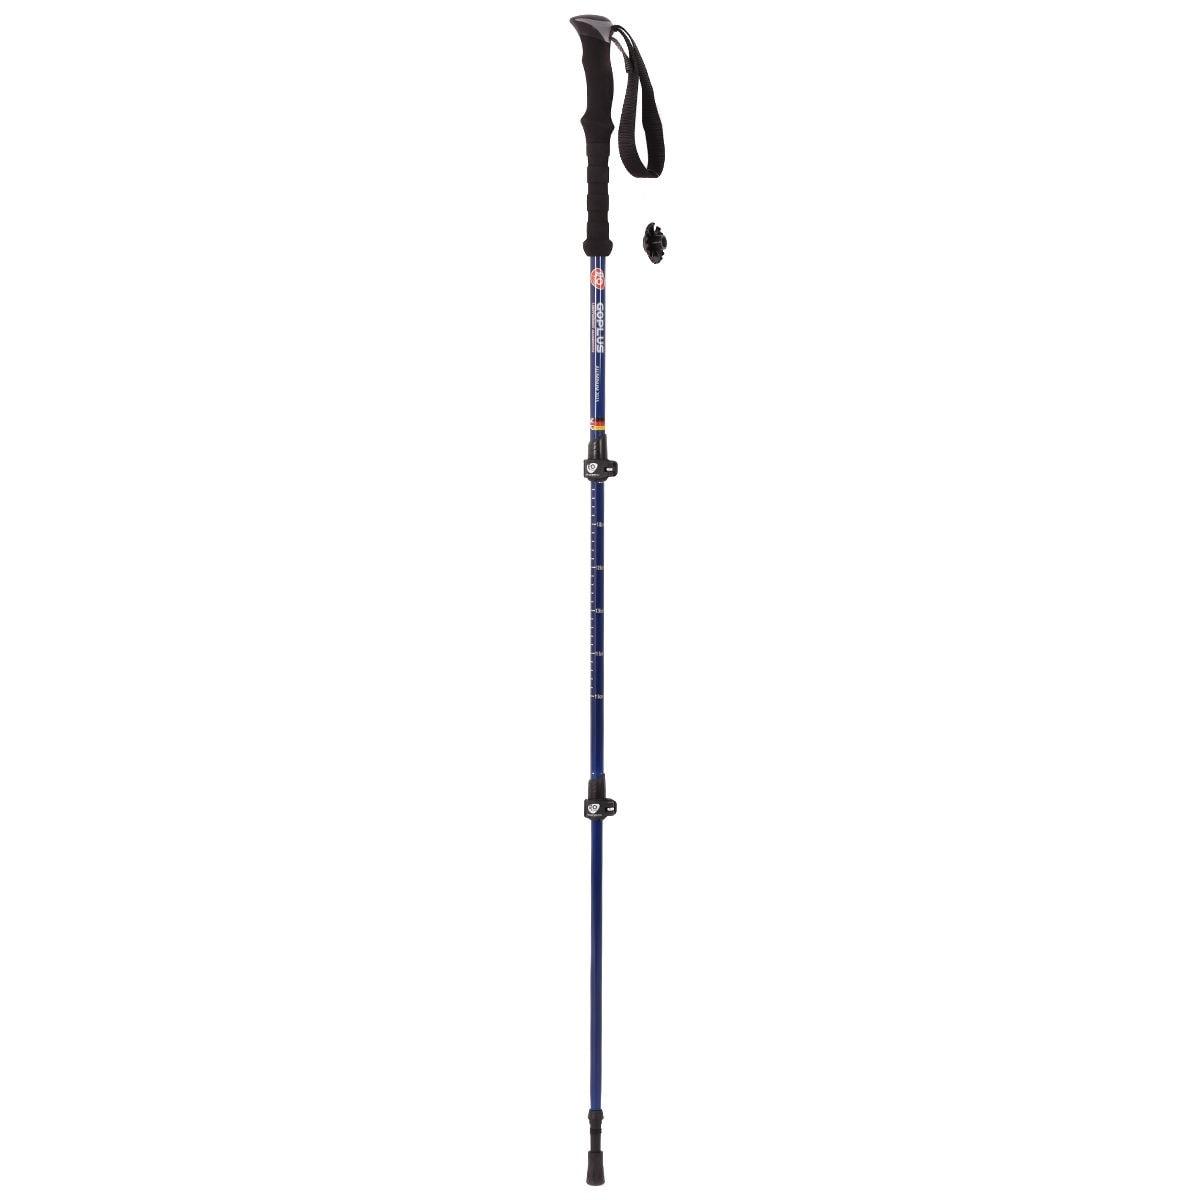 New Pair 2 Trekking Walking Hiking Sticks Poles Alpenstock Adjustable Anti-Shock